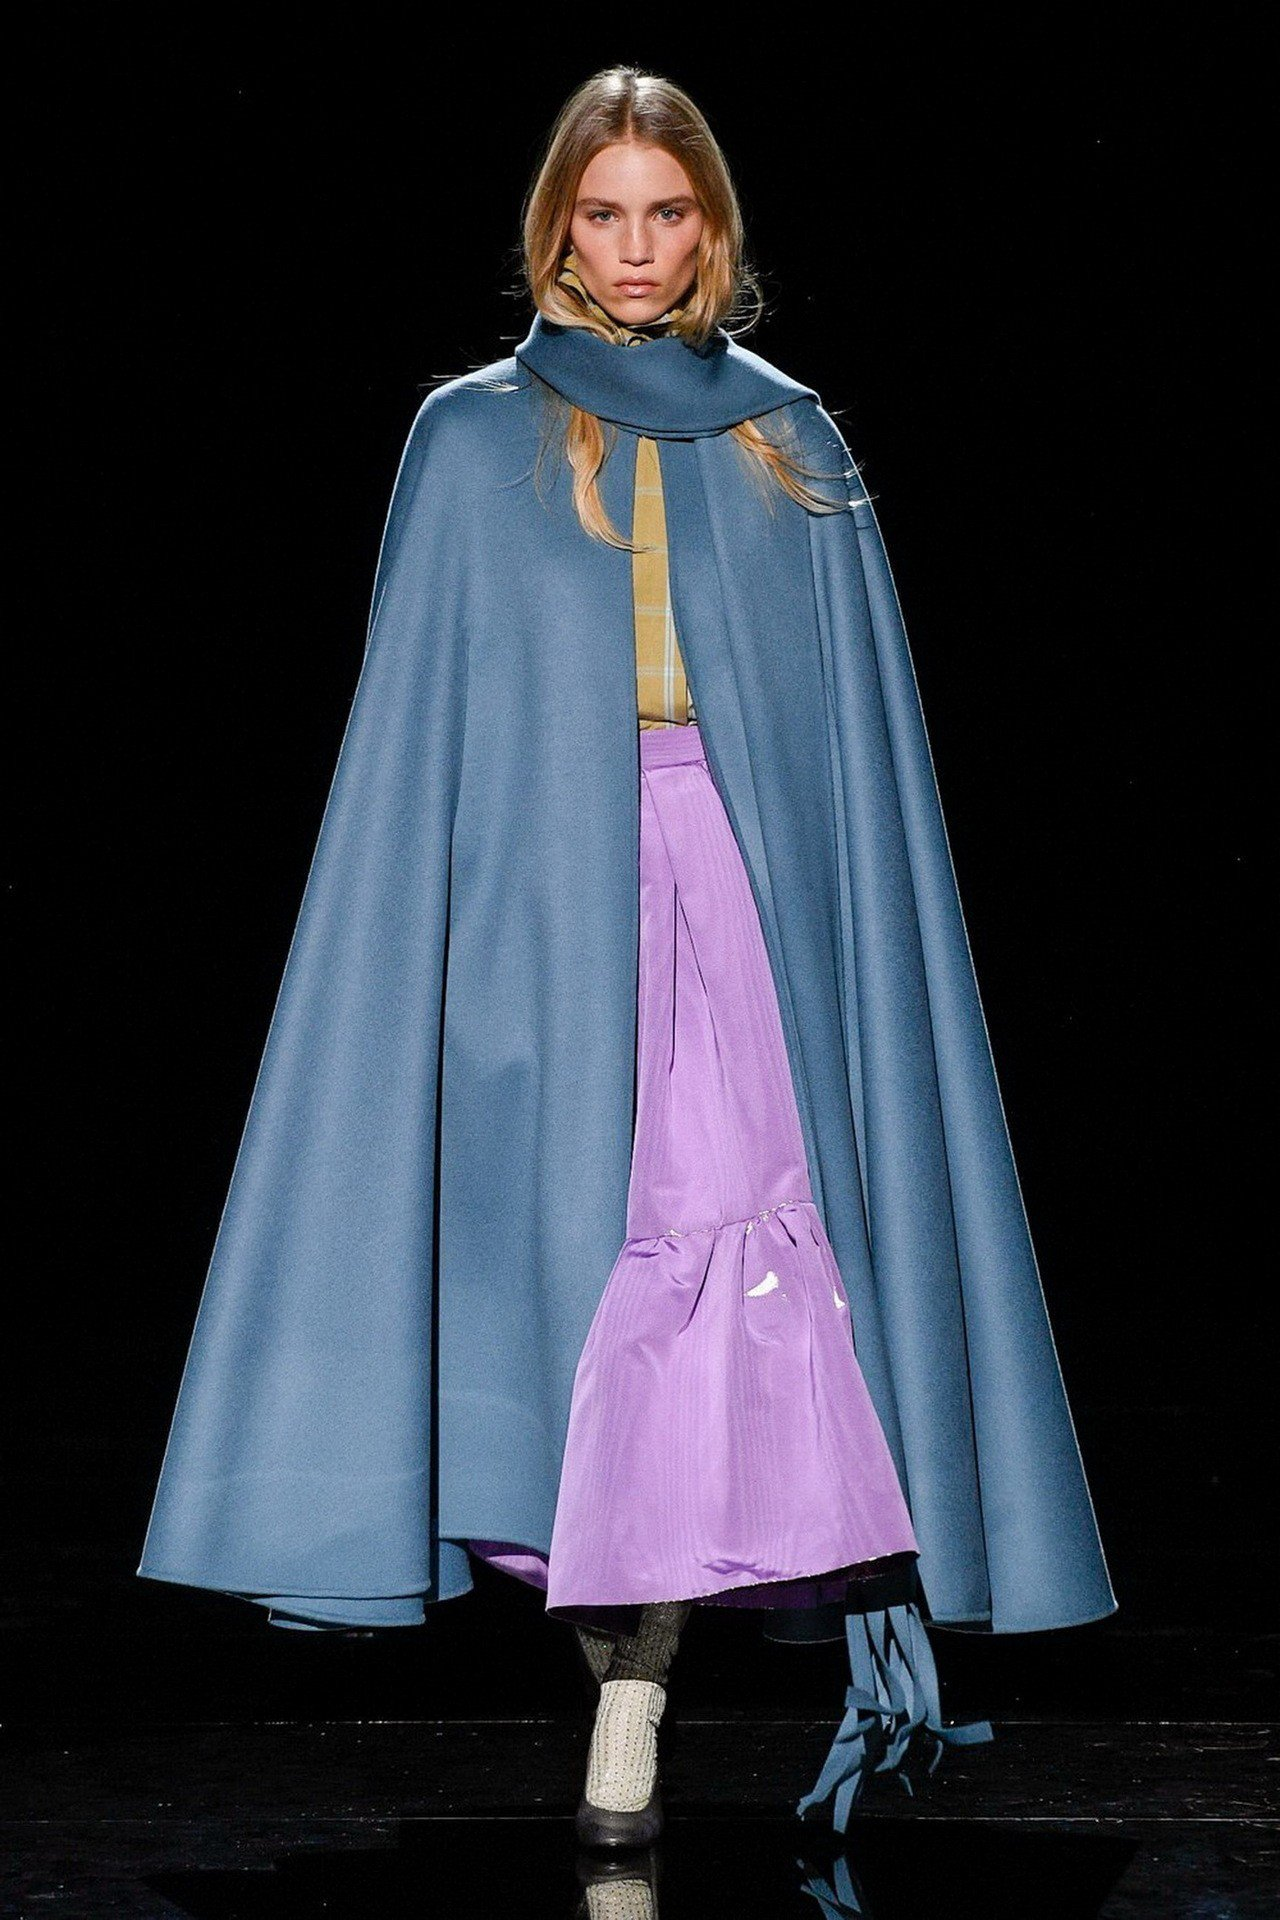 Marc Jacobs長斗篷與荷葉邊洋裝,如同公主般高貴。圖/Marc Jaco...